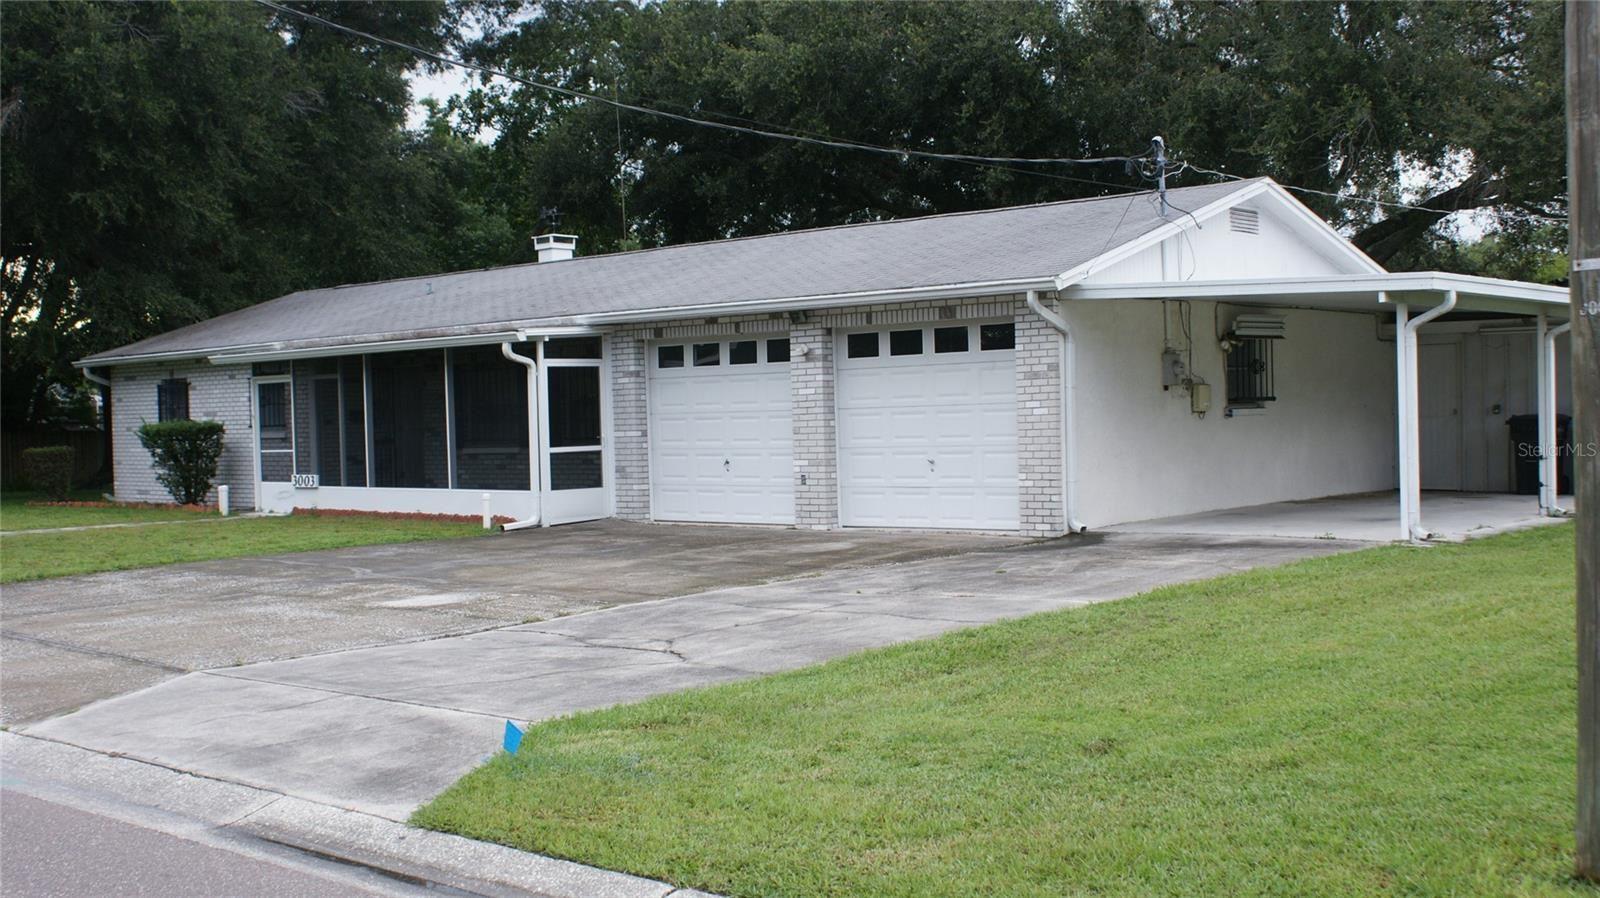 3003 W HENRY AVENUE, Tampa, FL 33614 - #: T3327066